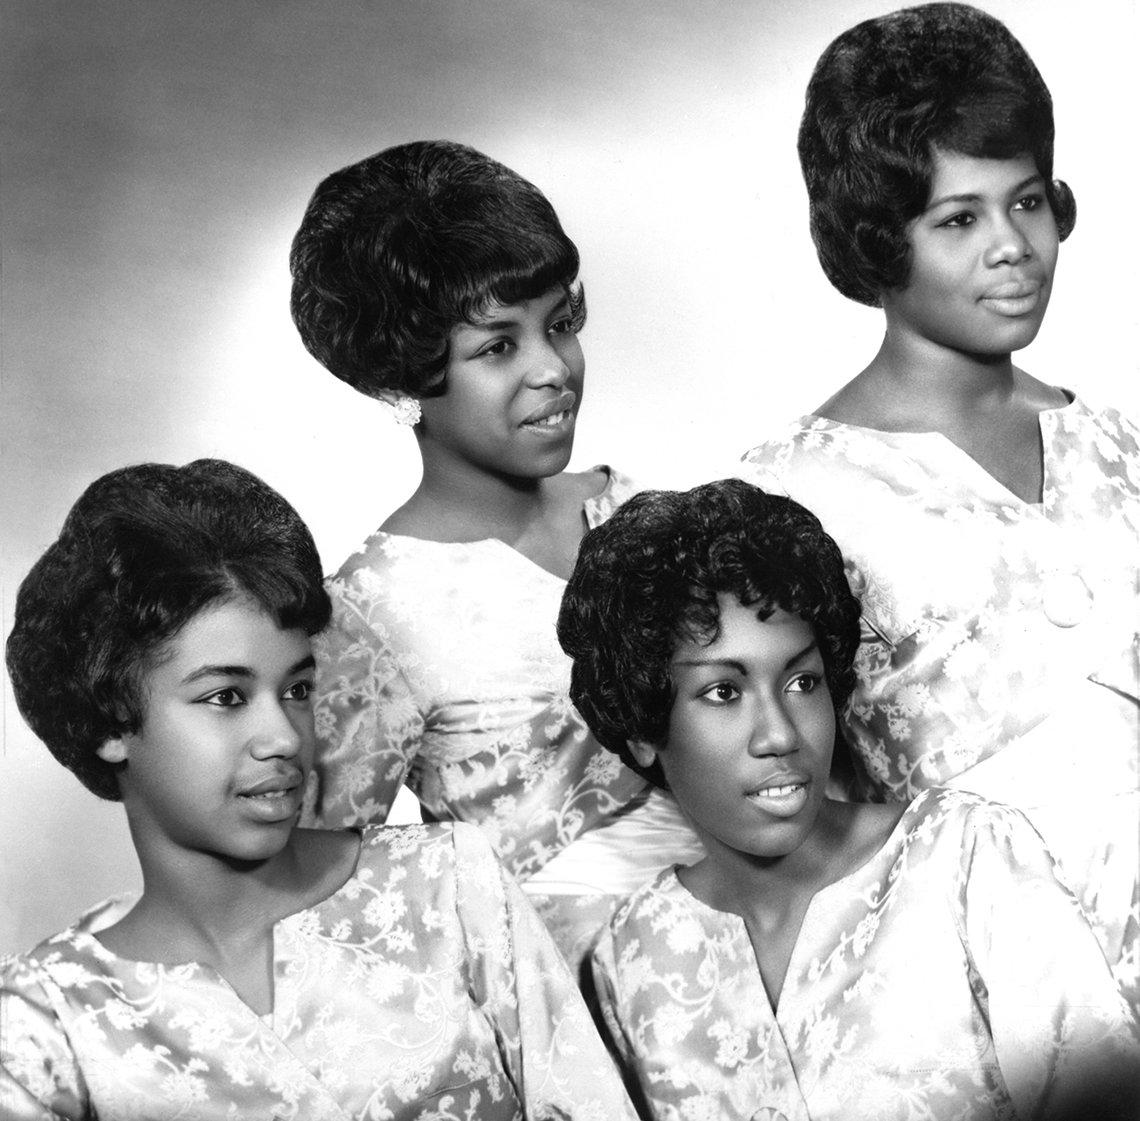 Grupo The Marvelettes